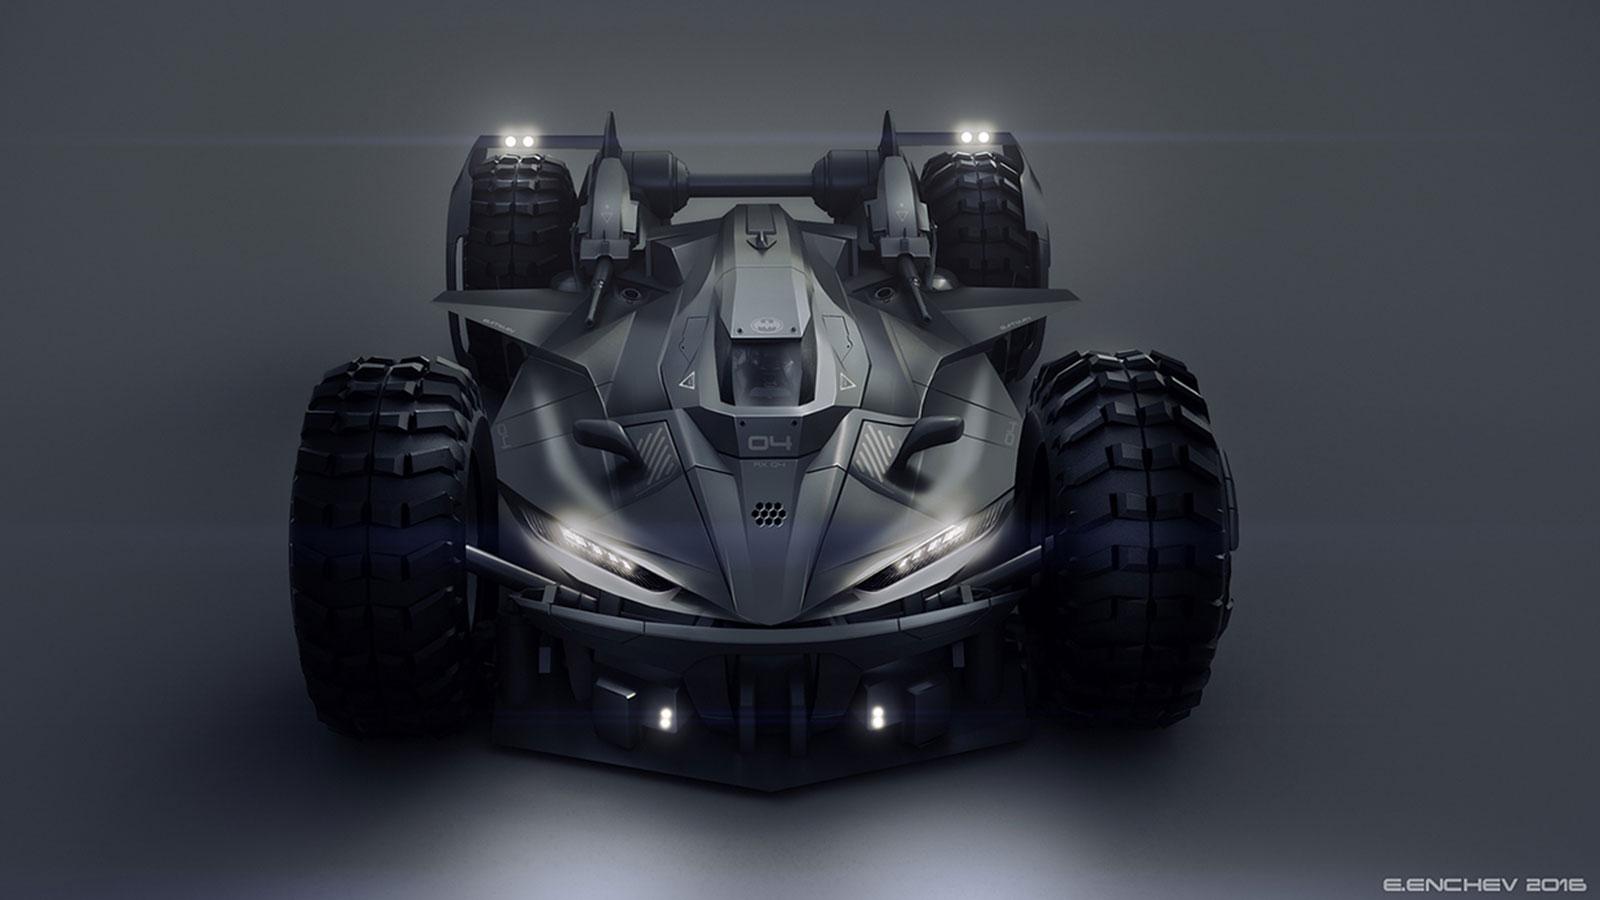 Batmobile-Concept-By-Encho-Enchev-3